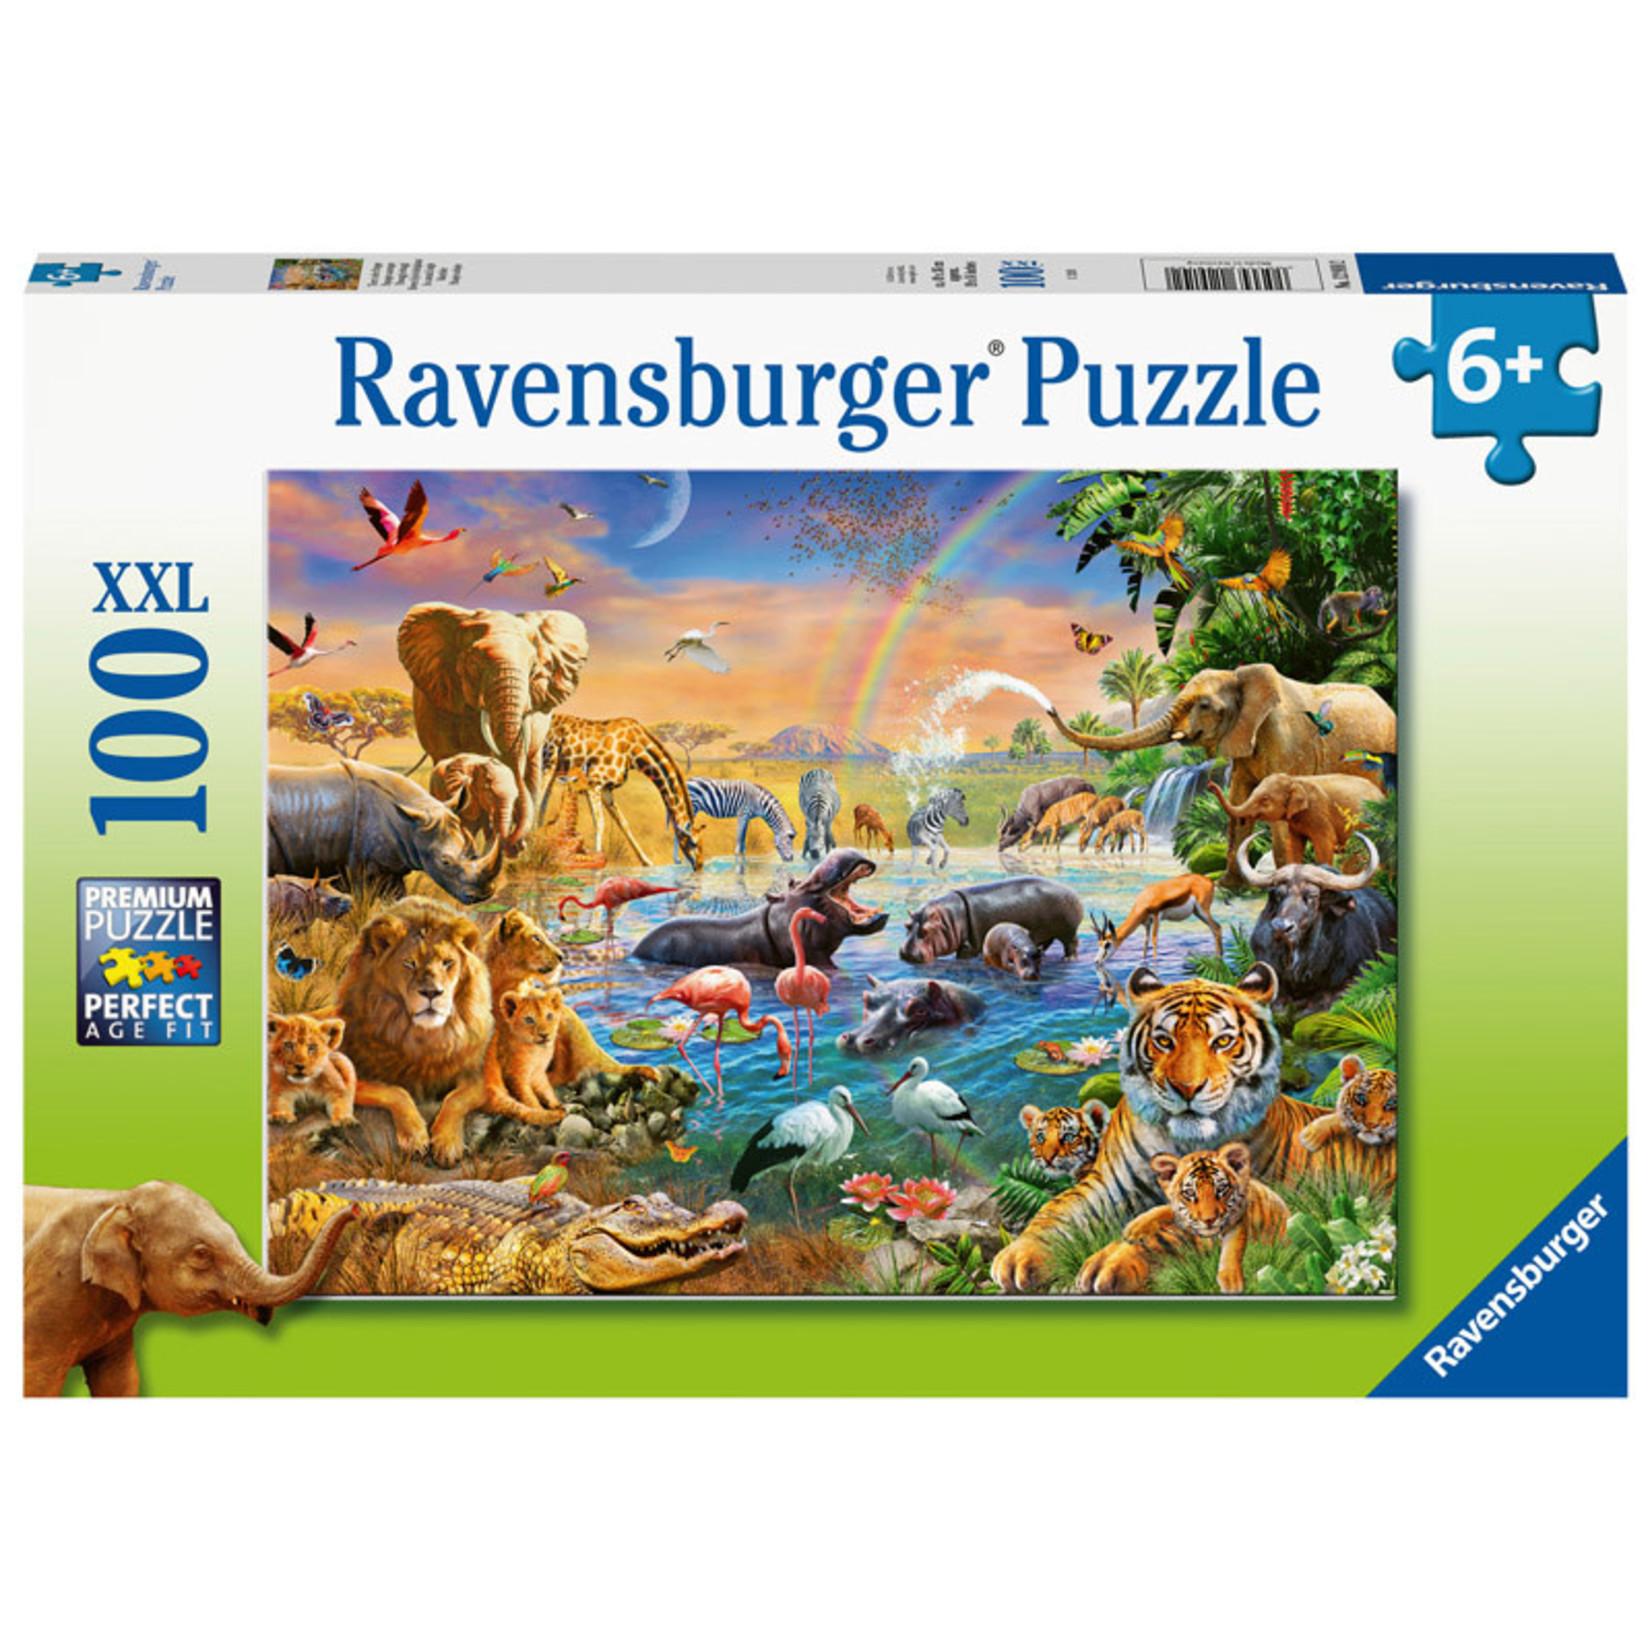 Ravensburger Savannah Jungle Waterhole 100pc